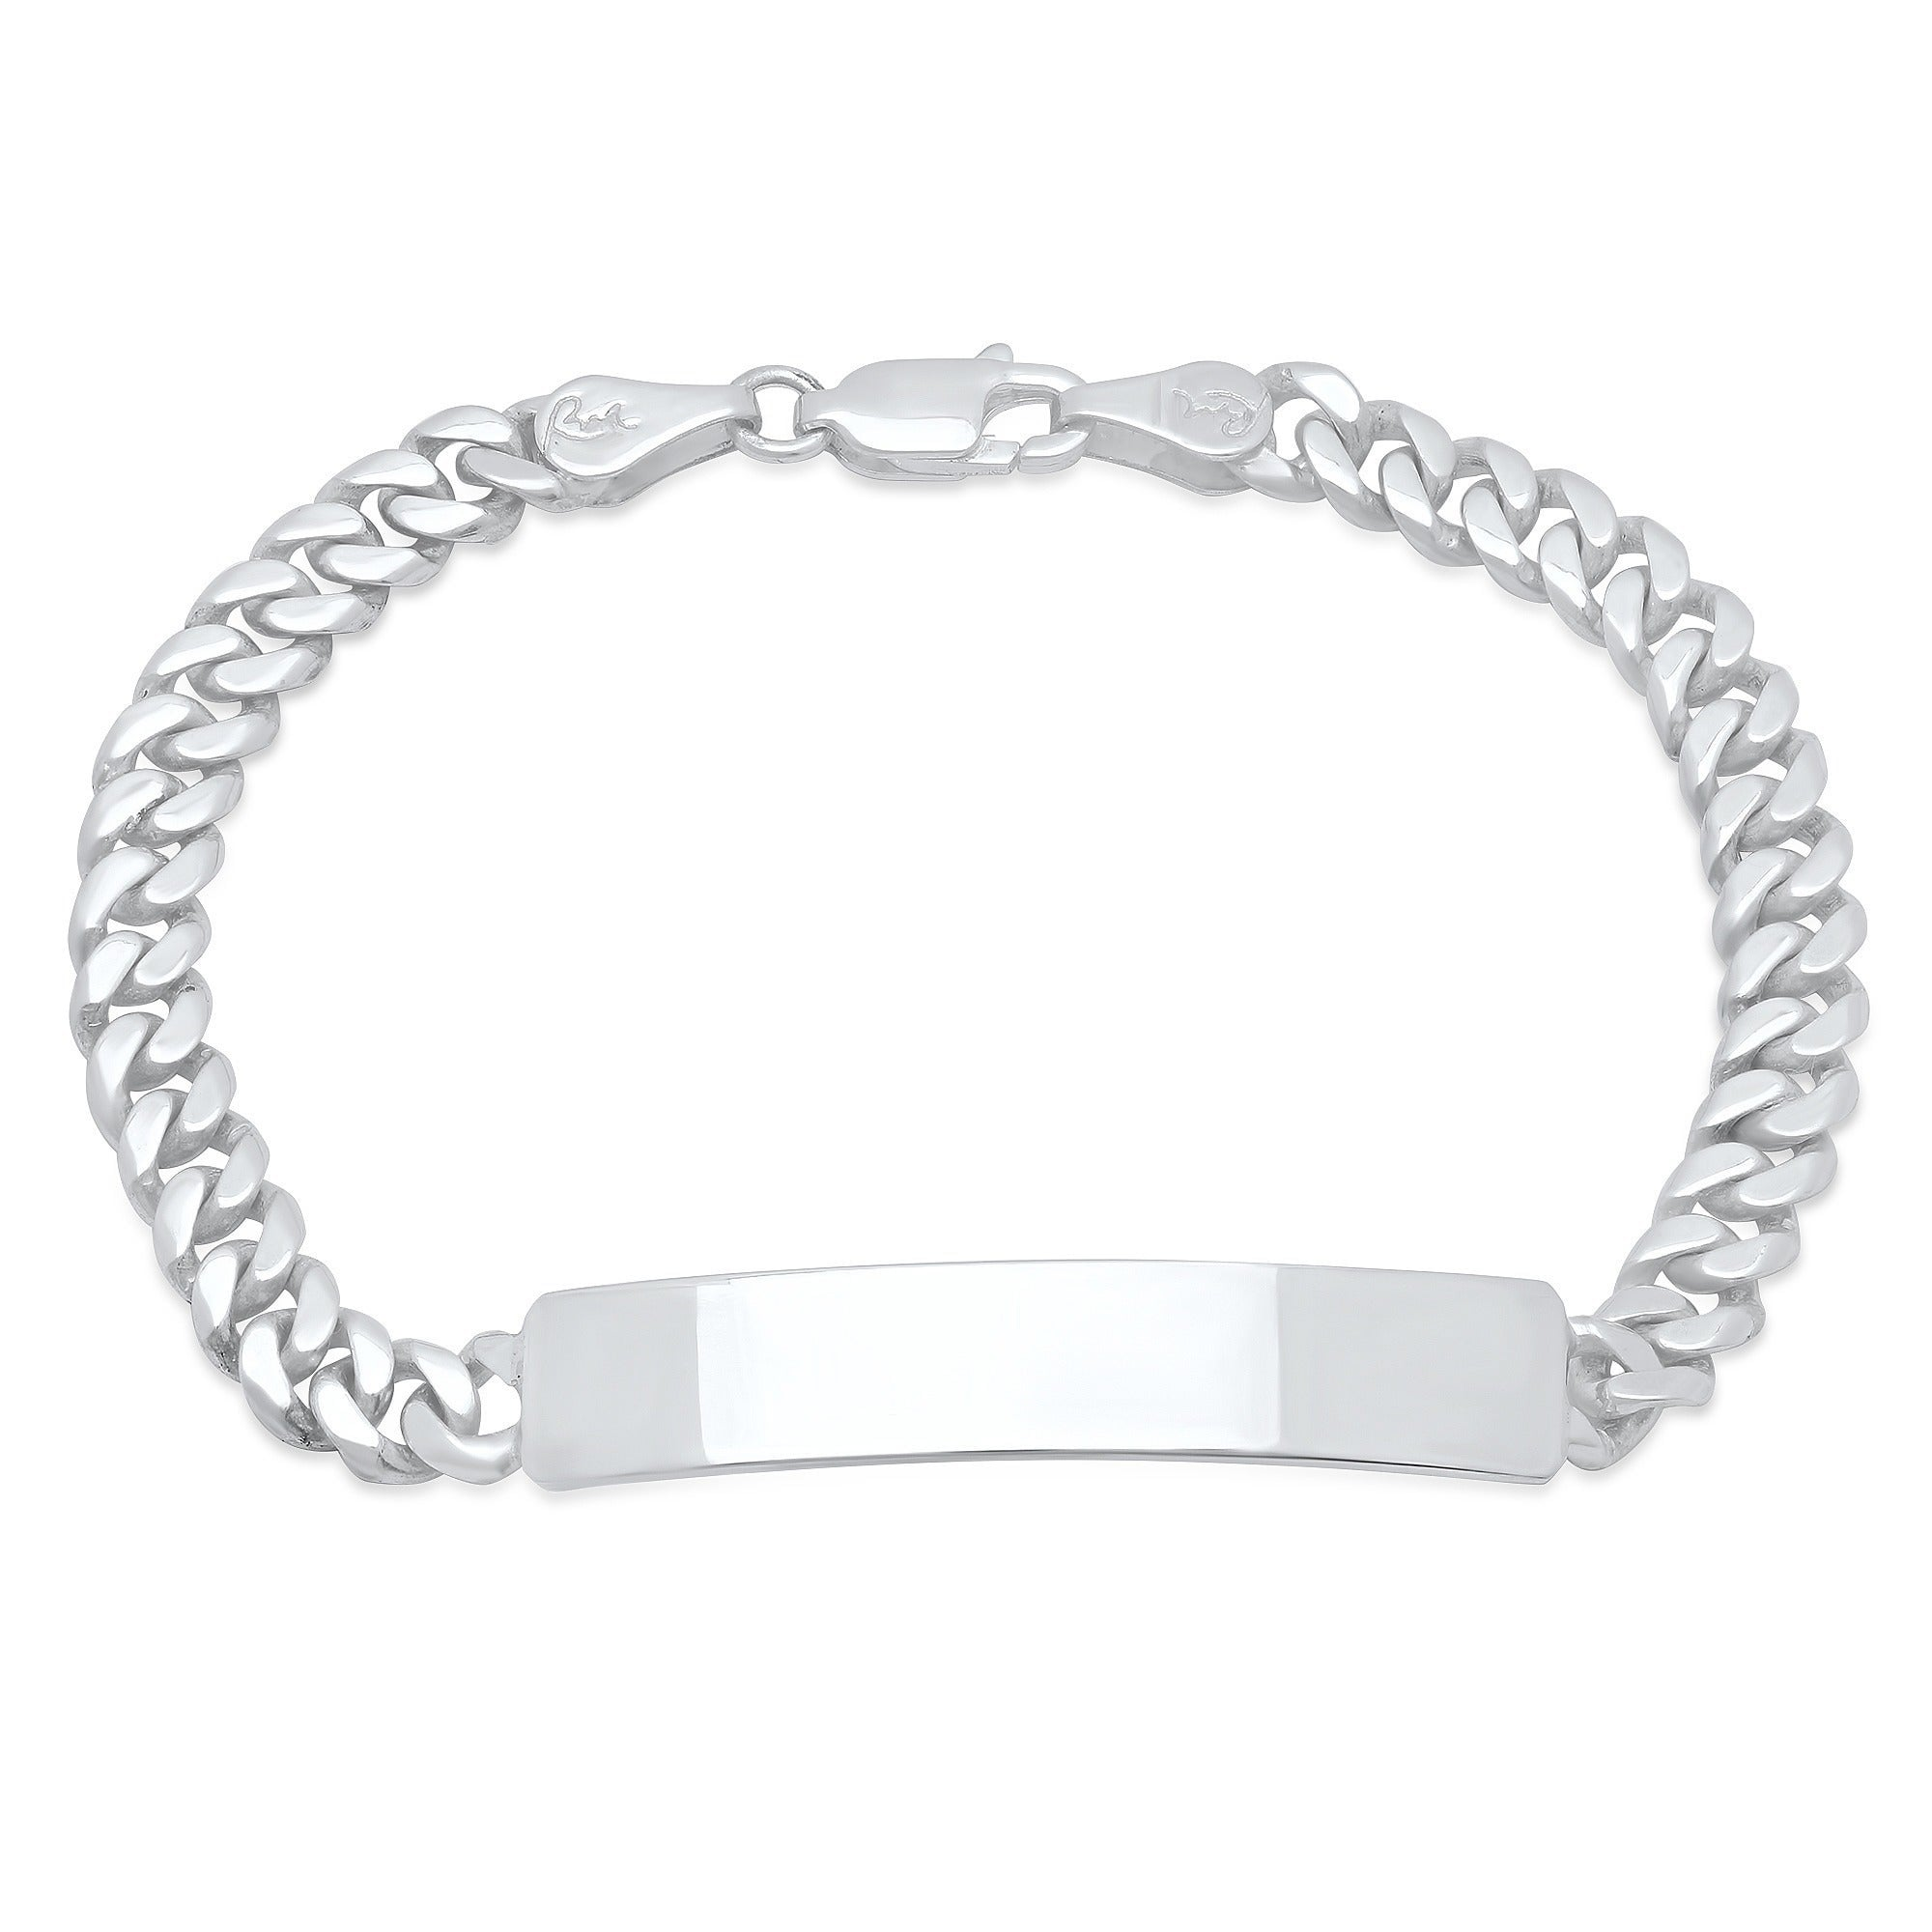 Platinum Sterling Silver Cuban Link Child ID Name Bracelet Free Engraving Gift